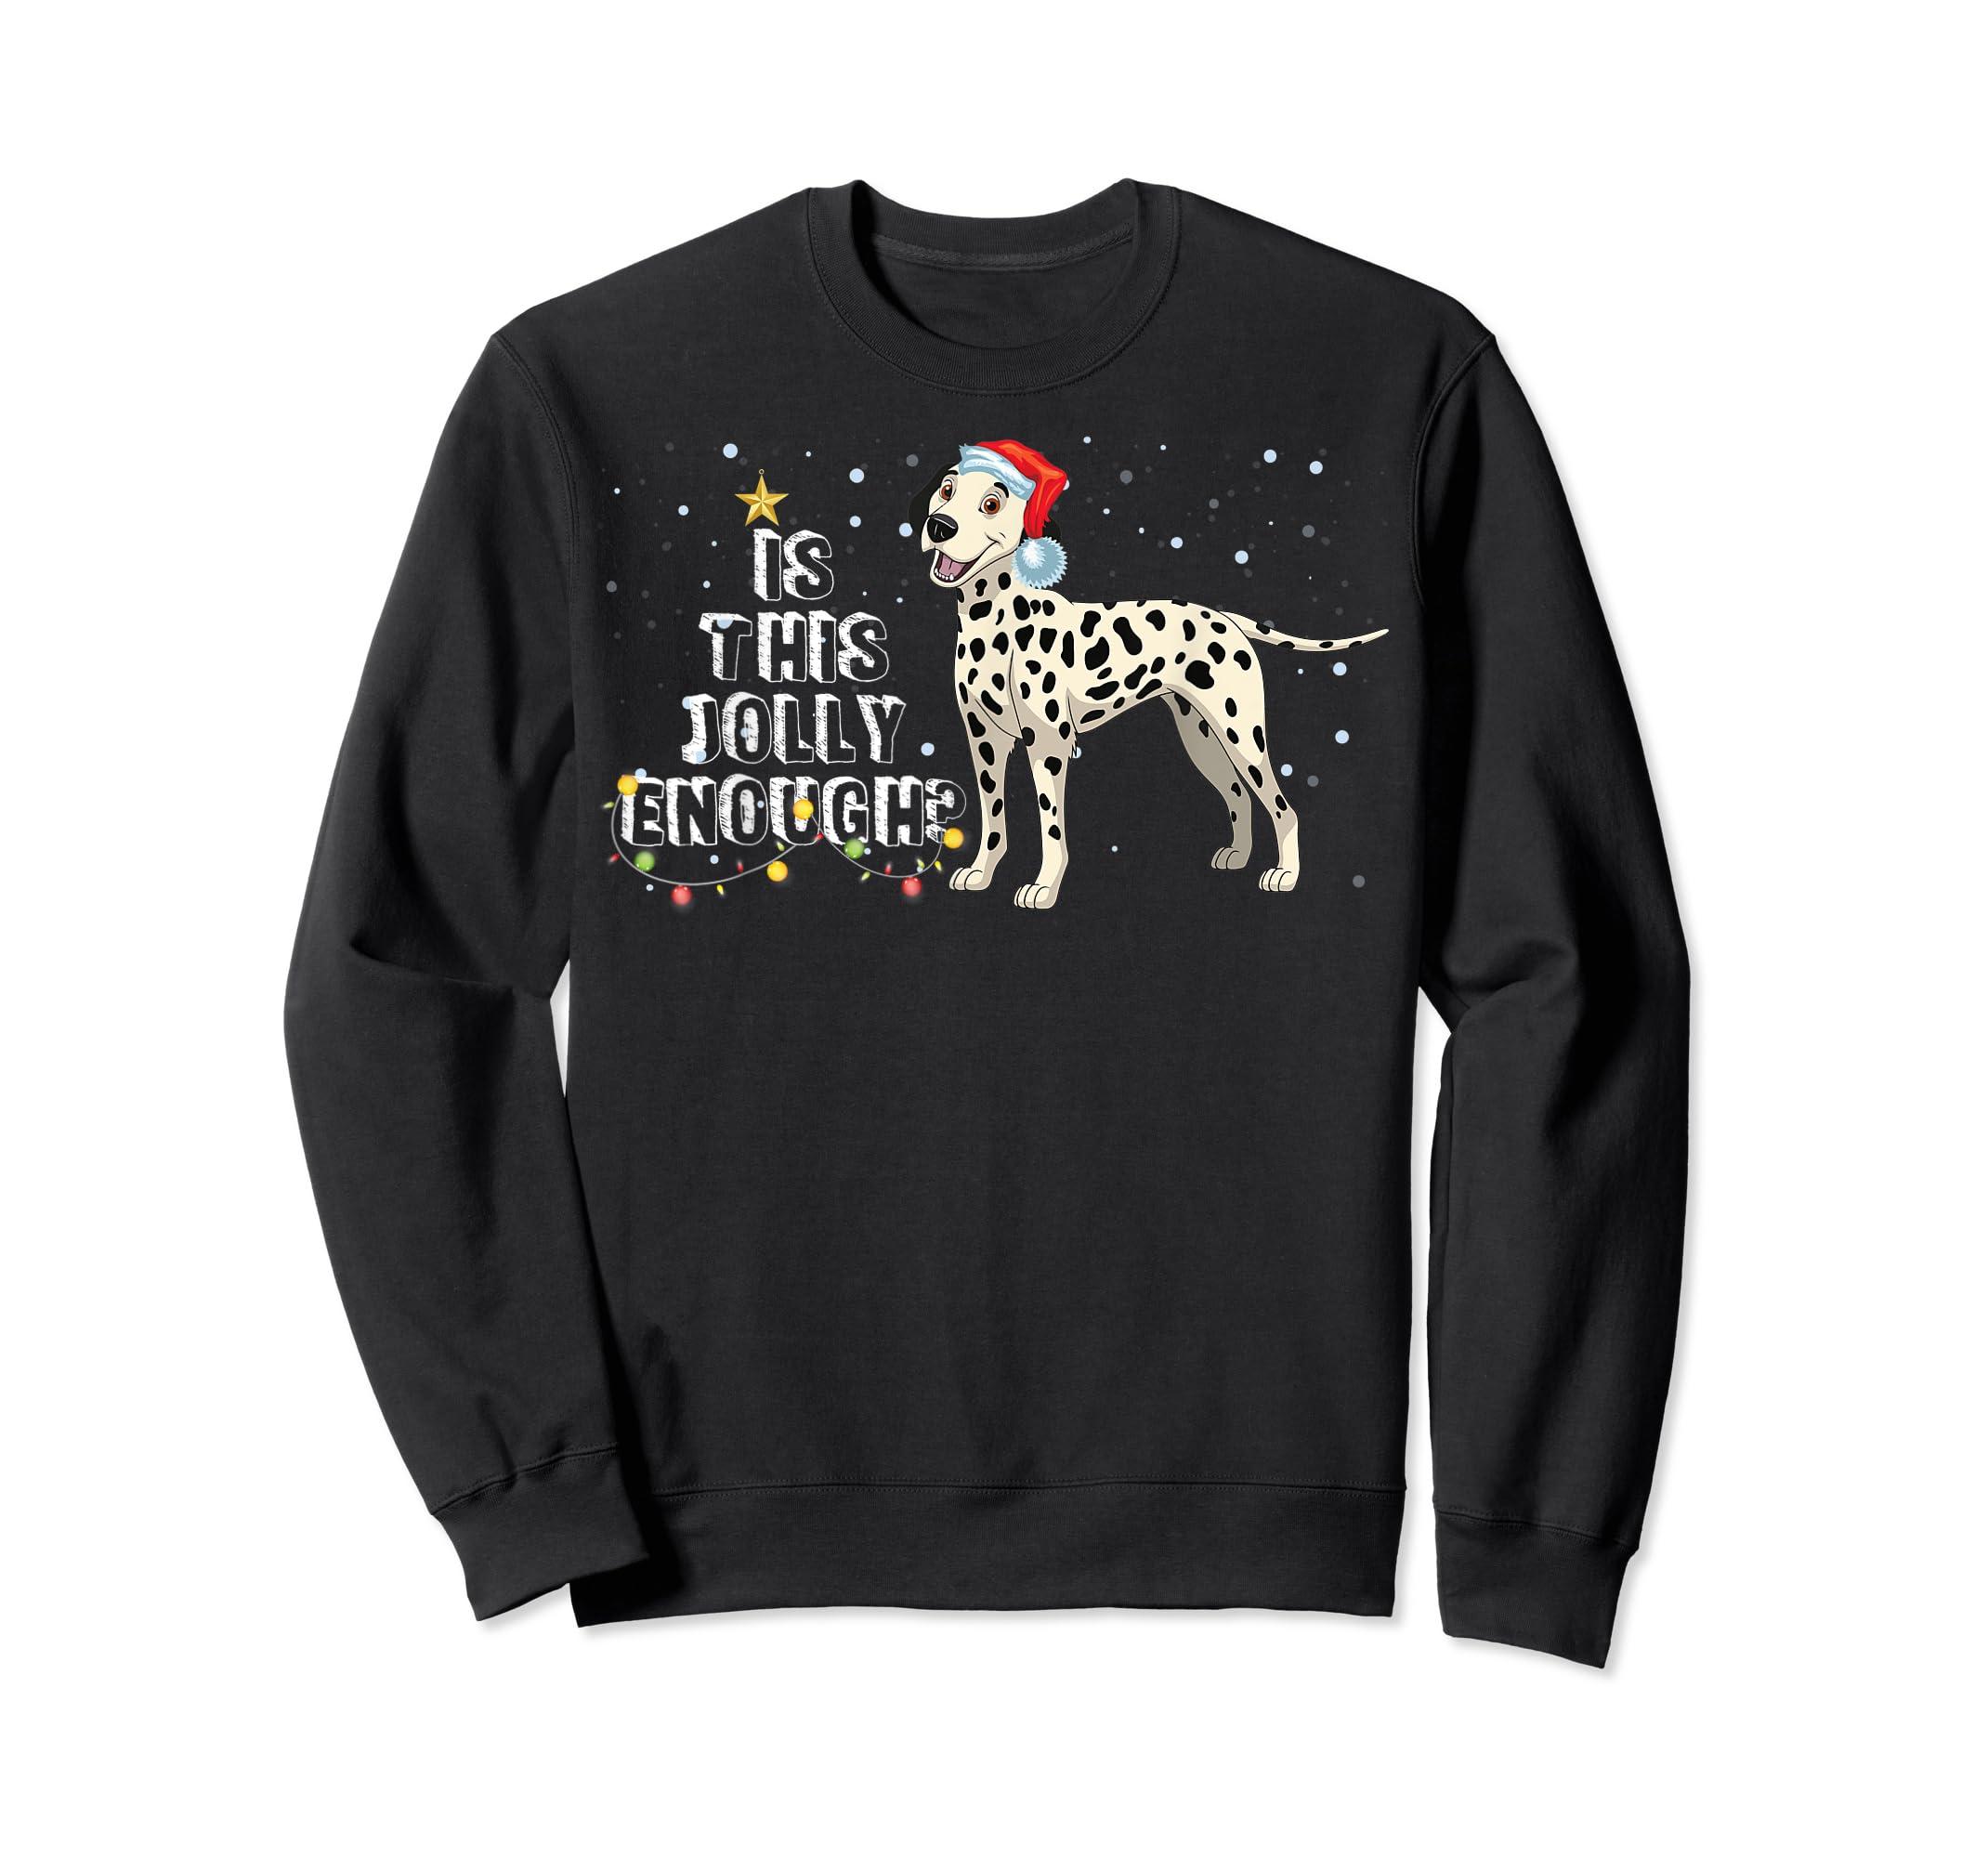 Dalmatian Santa Is This Jolly Enough Christmas Gifts T-Shirt-Sweatshirt-Black